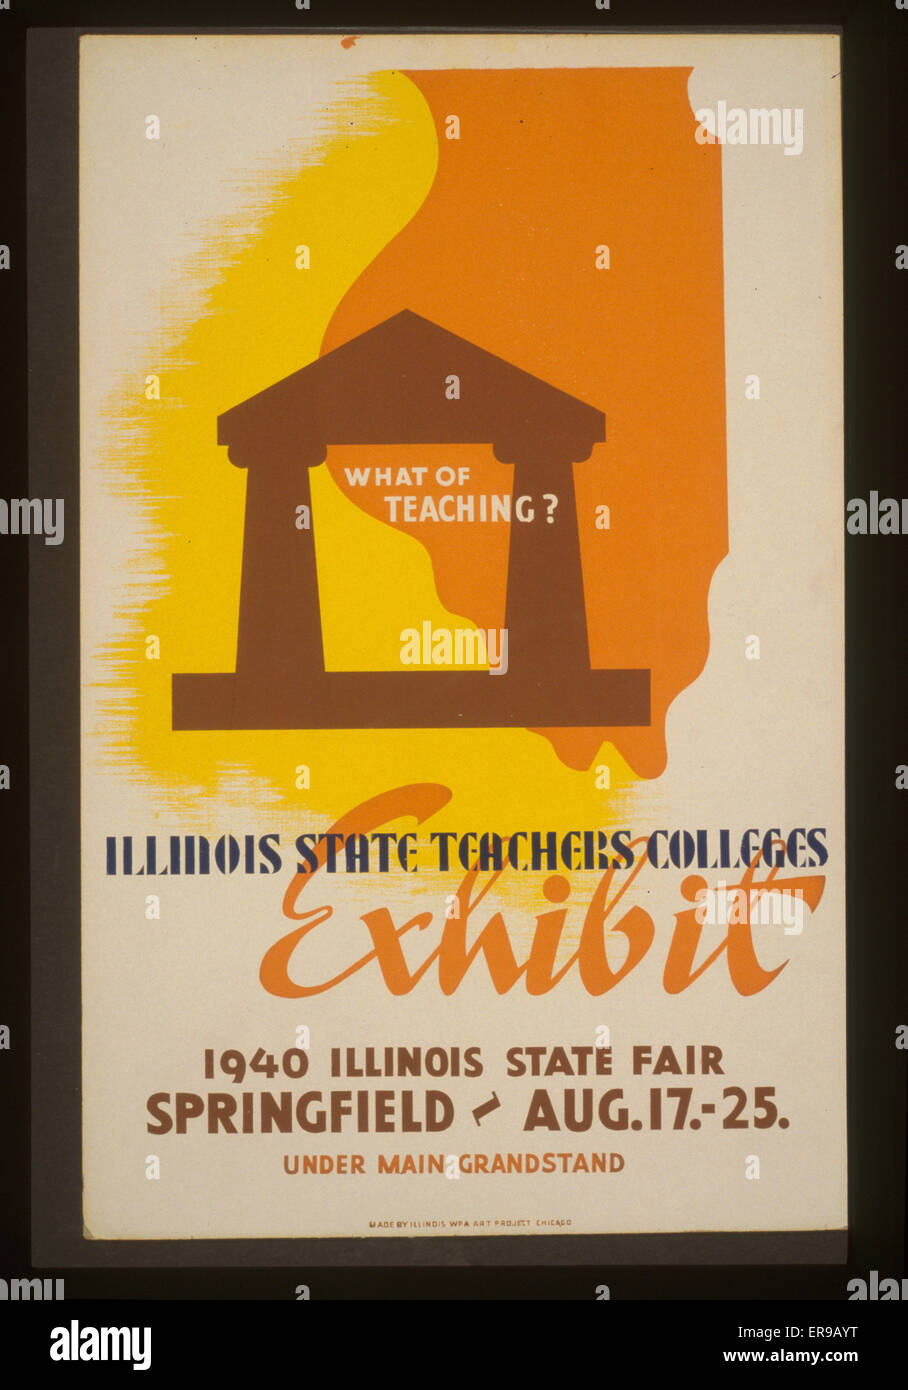 What of teaching? Illinois state teachers colleges exhibit. Poster for Illinois State Teachers Colleges exhibit - Stock Image